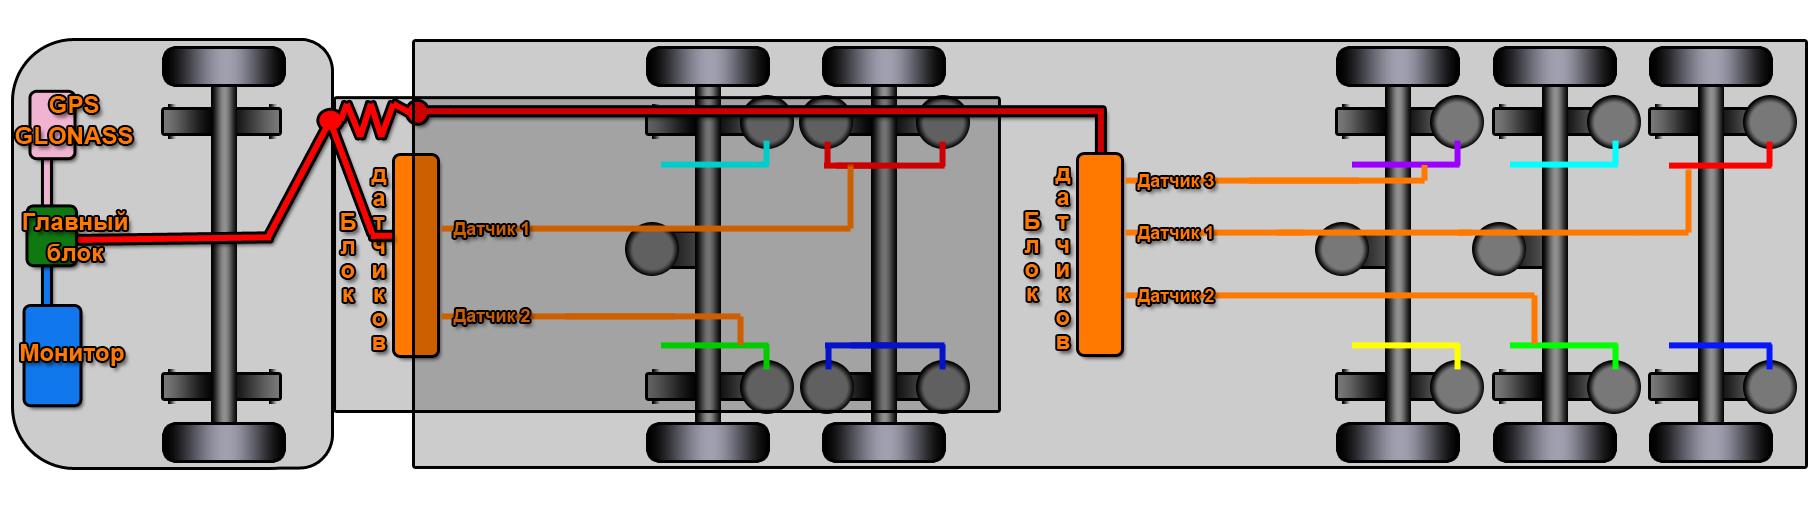 Монтаж GTscales система мониторинга автотранспорта